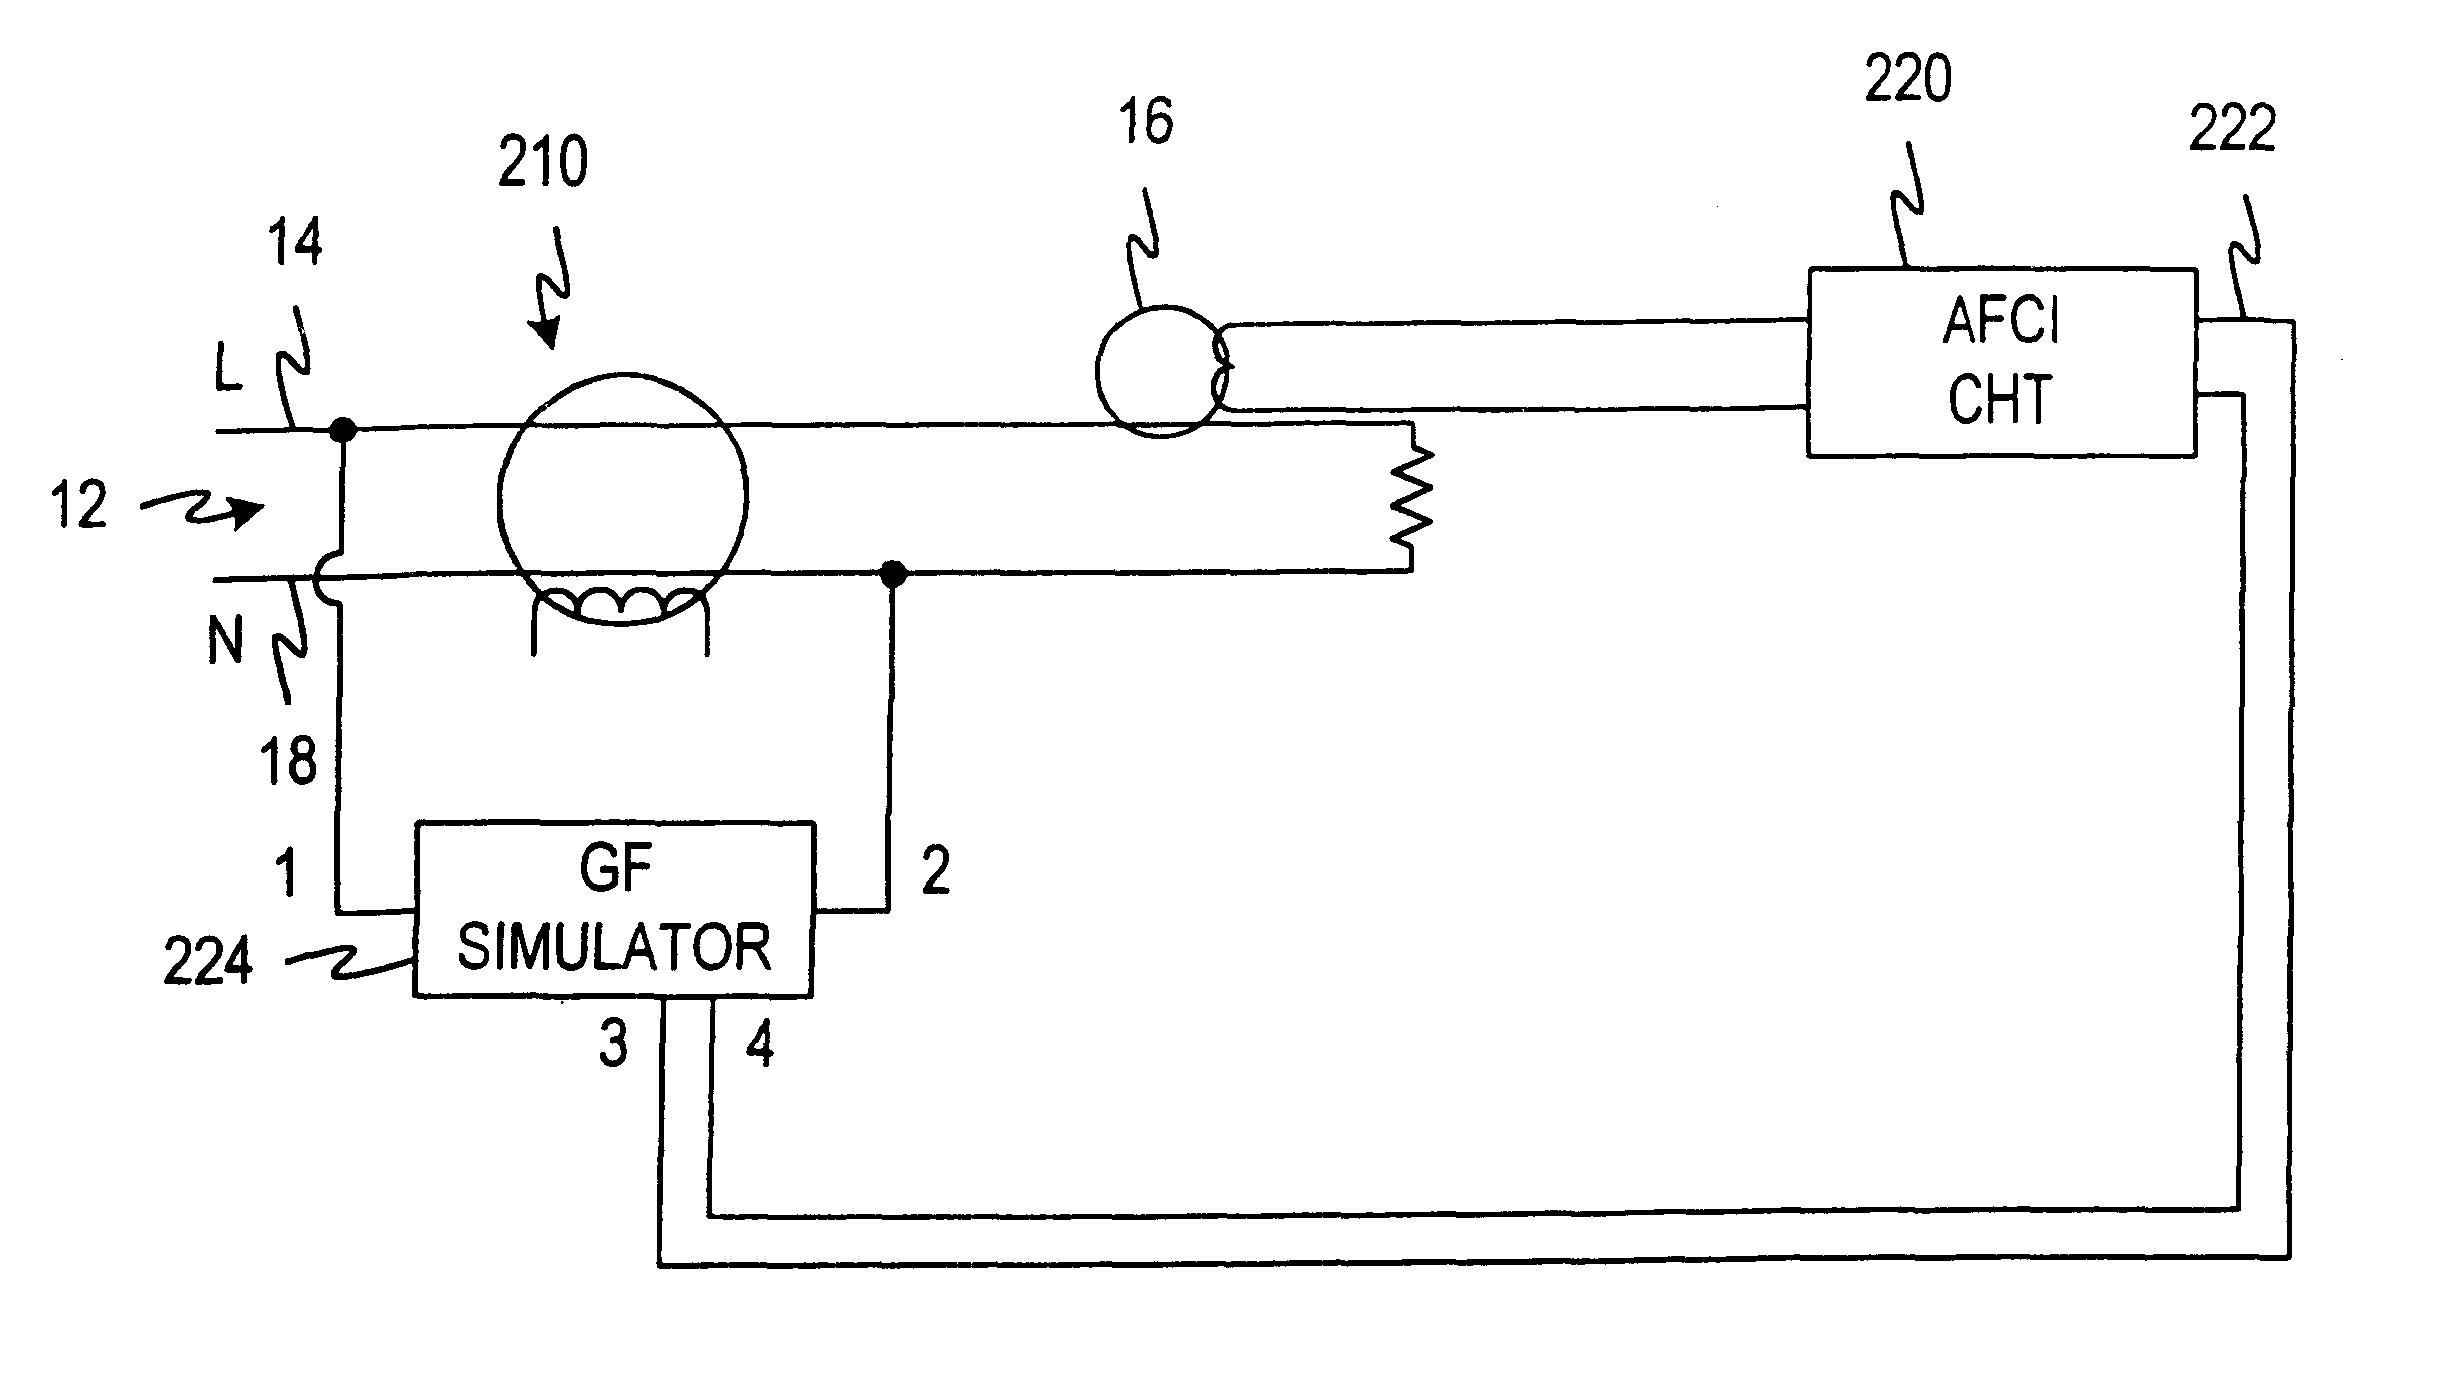 ford 900 wiring diagram rcbo wiring diagram - somurich.com rcbo wiring diagram